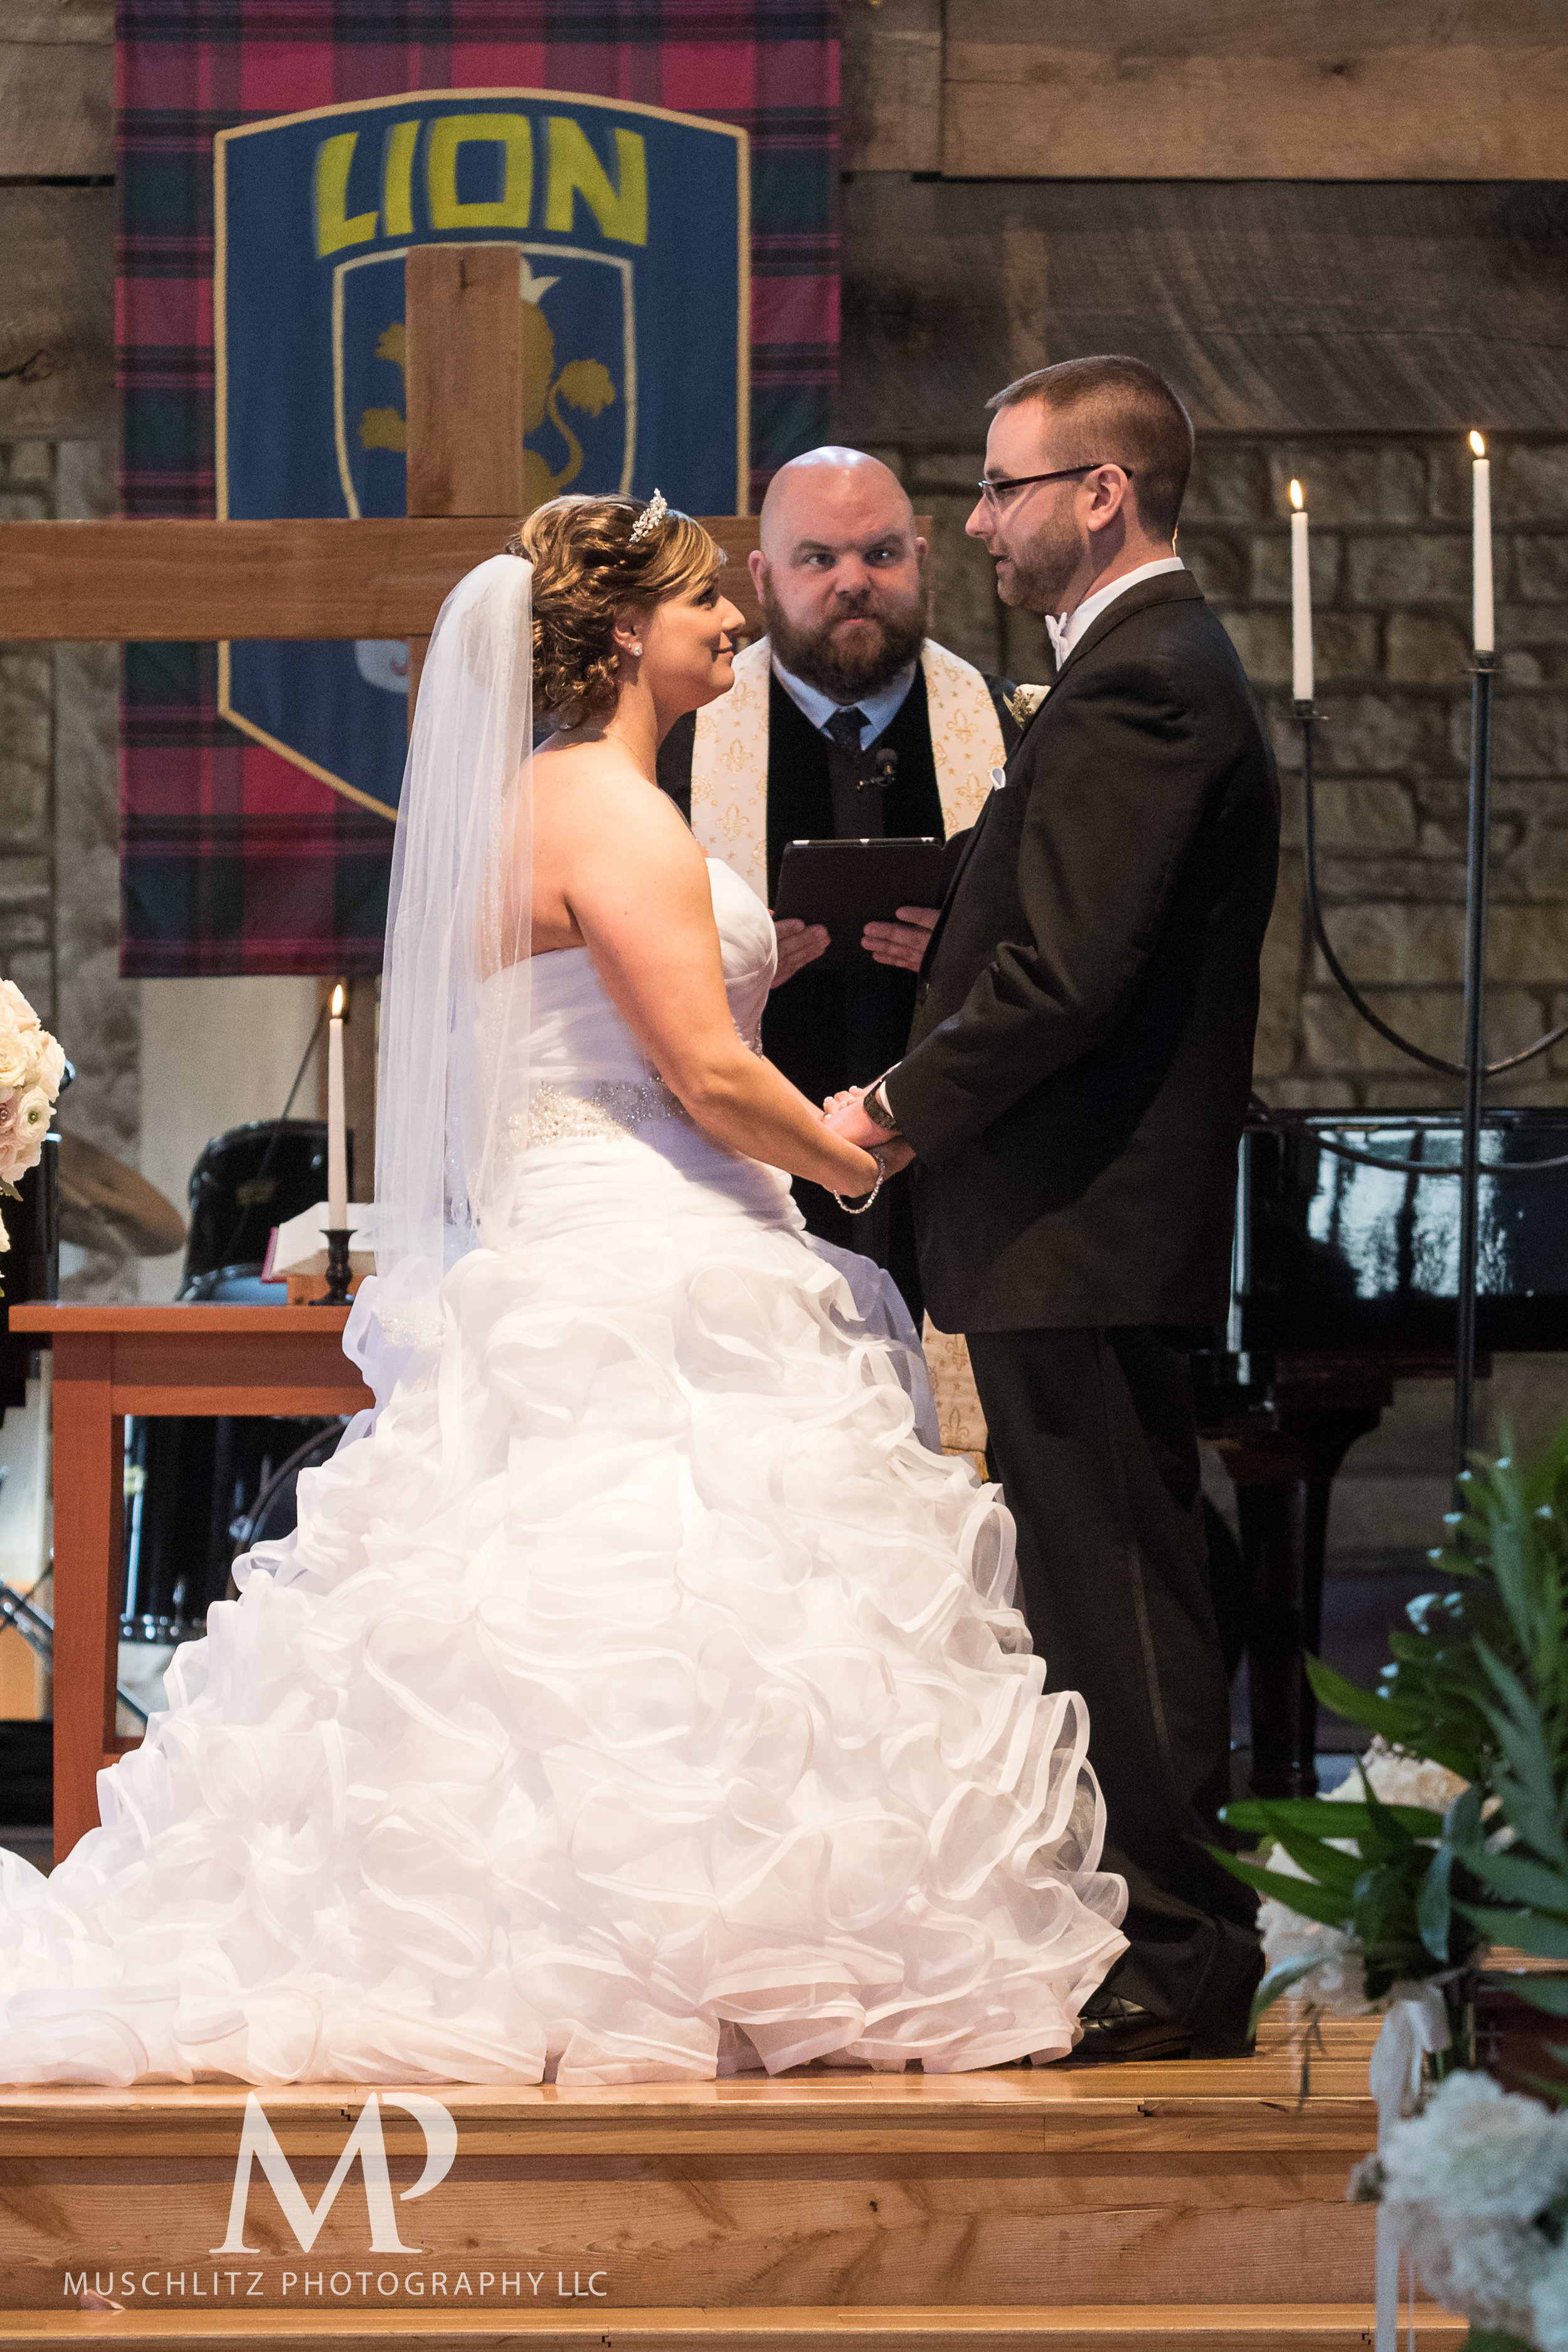 liberty-barn-presbyterian-church-wedding-delaware-columbus-ohio-muschlitz-photography-037.JPG